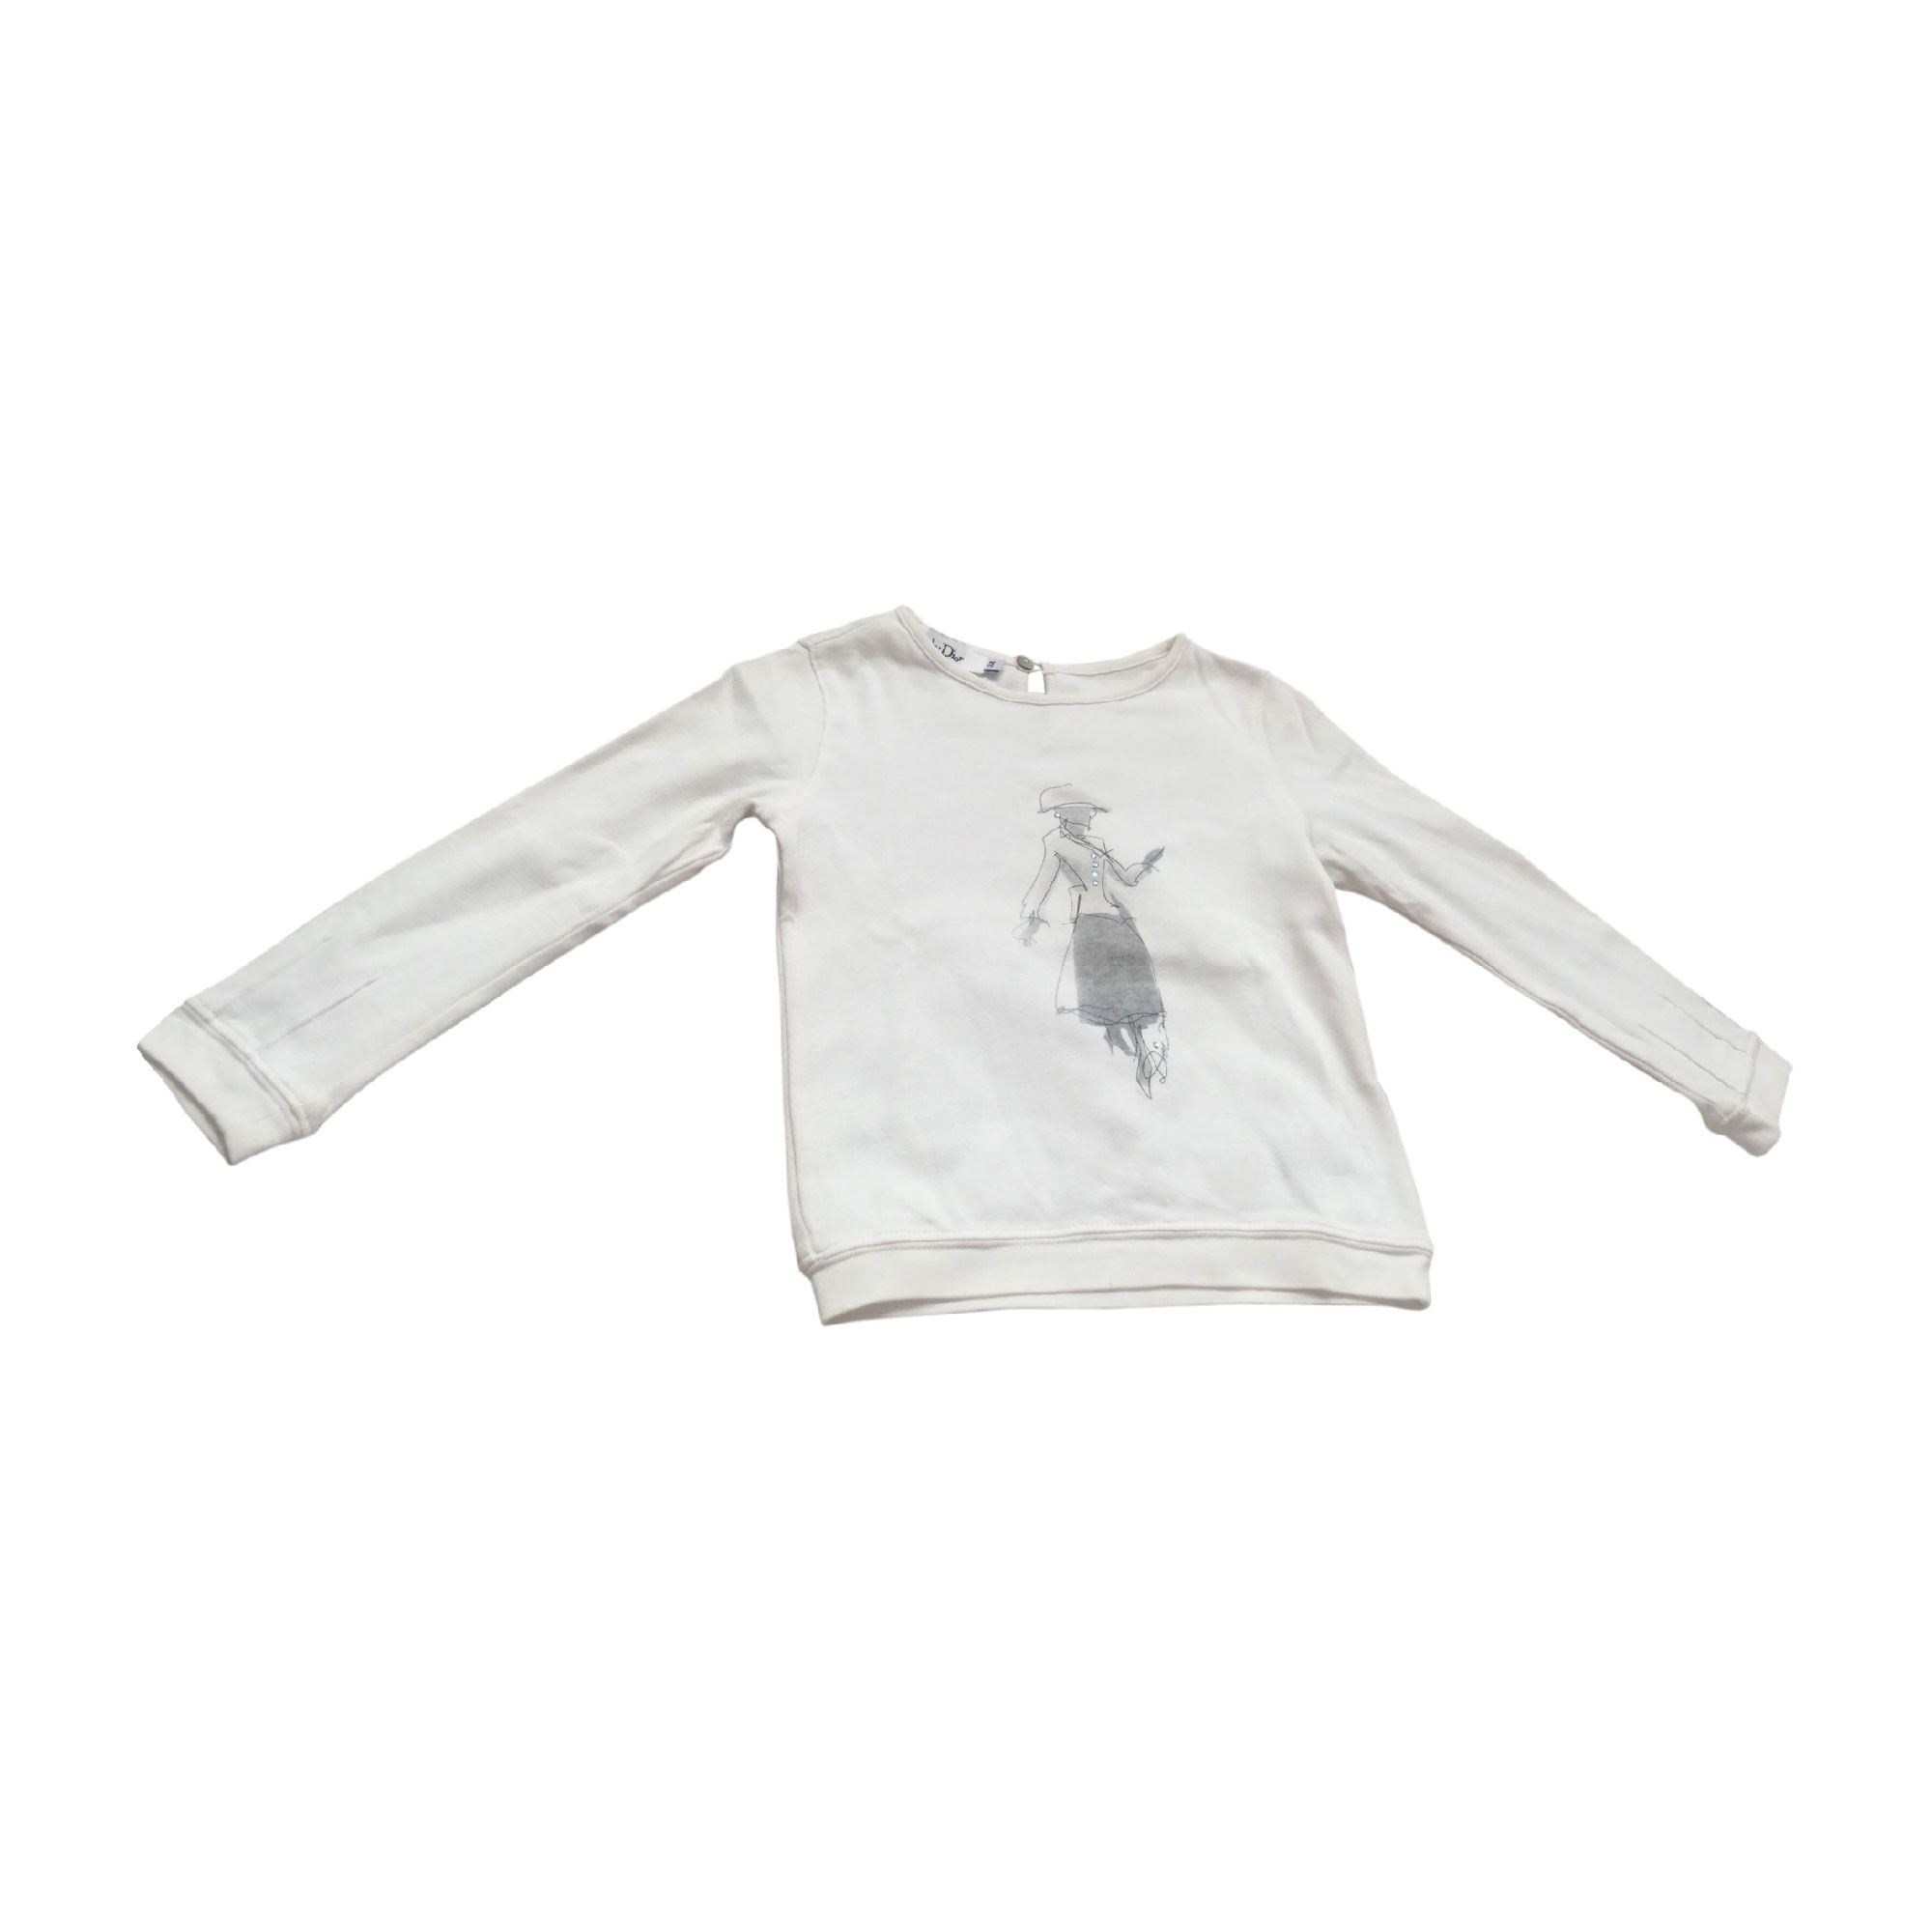 Maglione BABY DIOR Bianco, bianco sporco, ecru